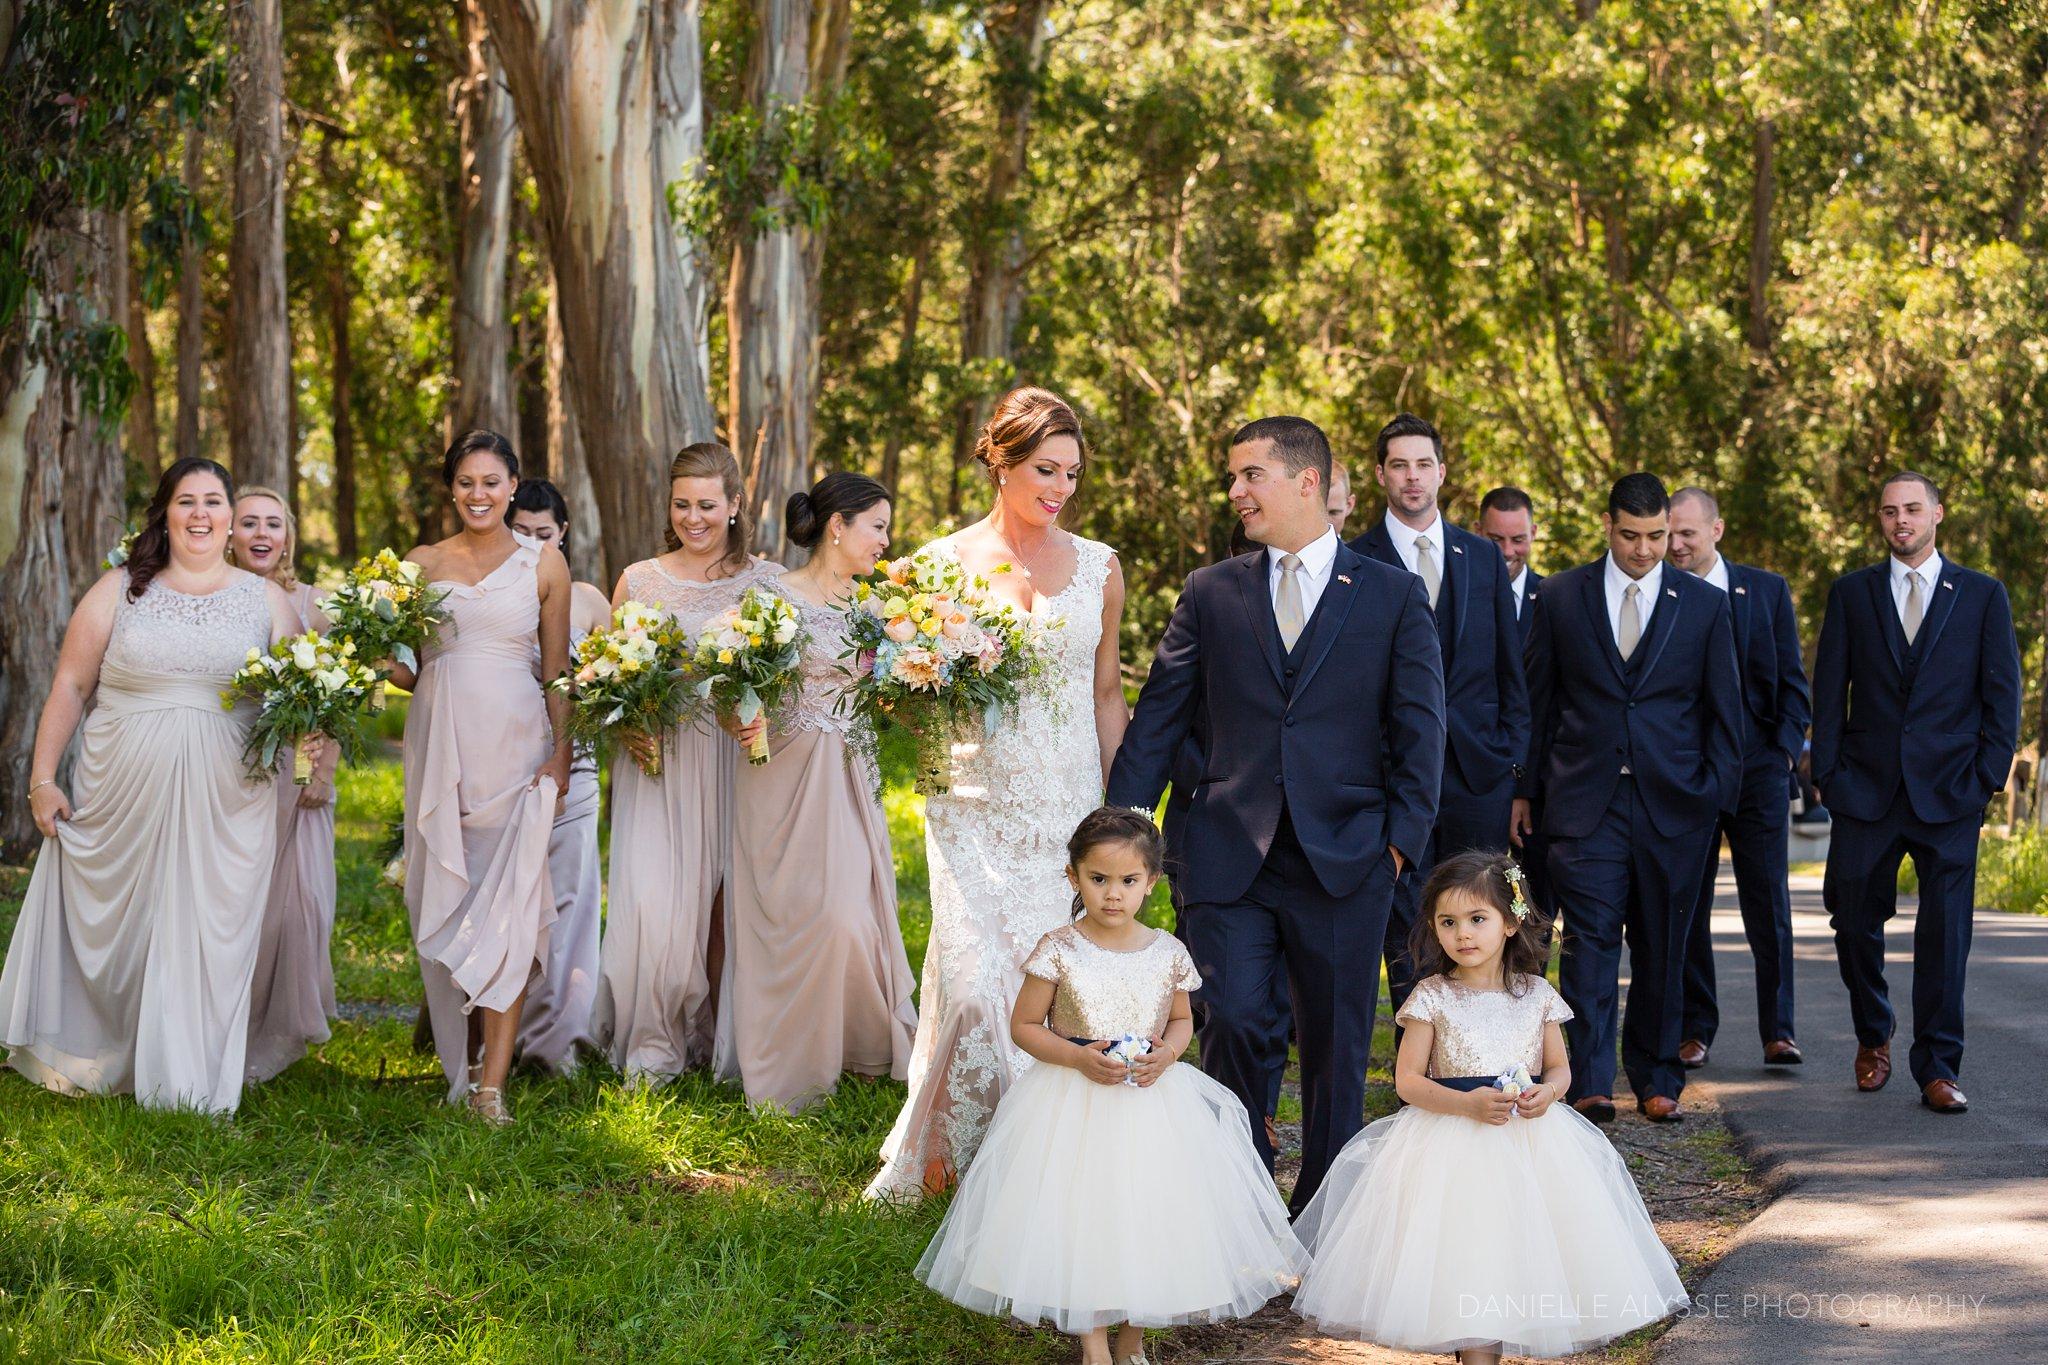 170429_blog_kimberly_ben_wedding_san_mateo_curiodyssey_danielle_alysse_photography_sacramento_photographer0342_WEB.jpg